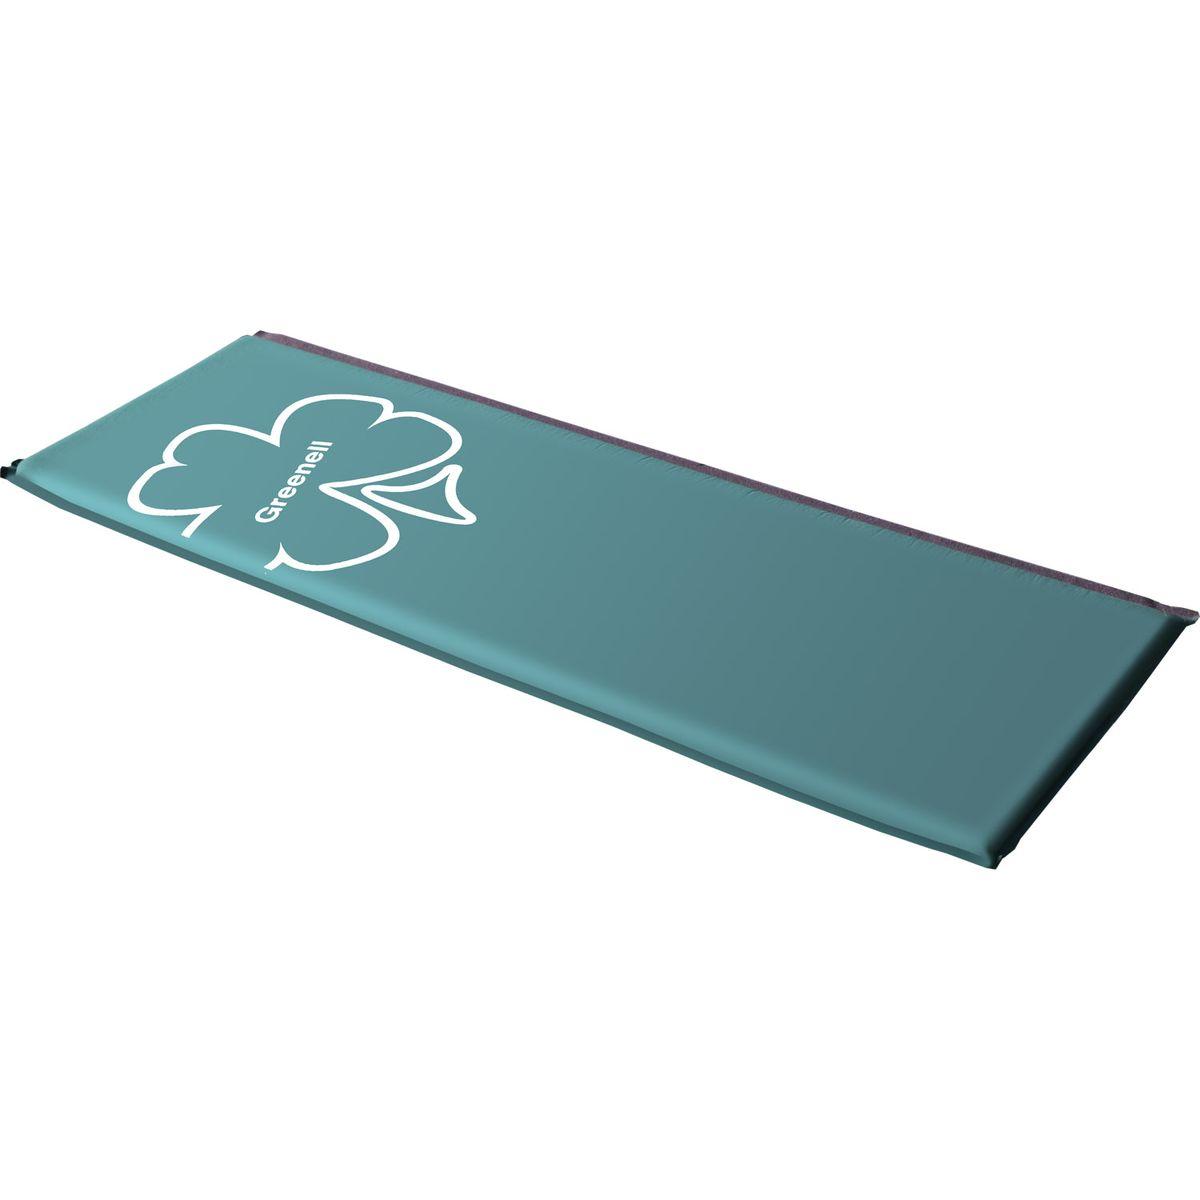 "Коврик самонадувающийся Greenell ""Классик"", цвет: зеленый, 198 см х 63 см х 5 см 95260-366-00"